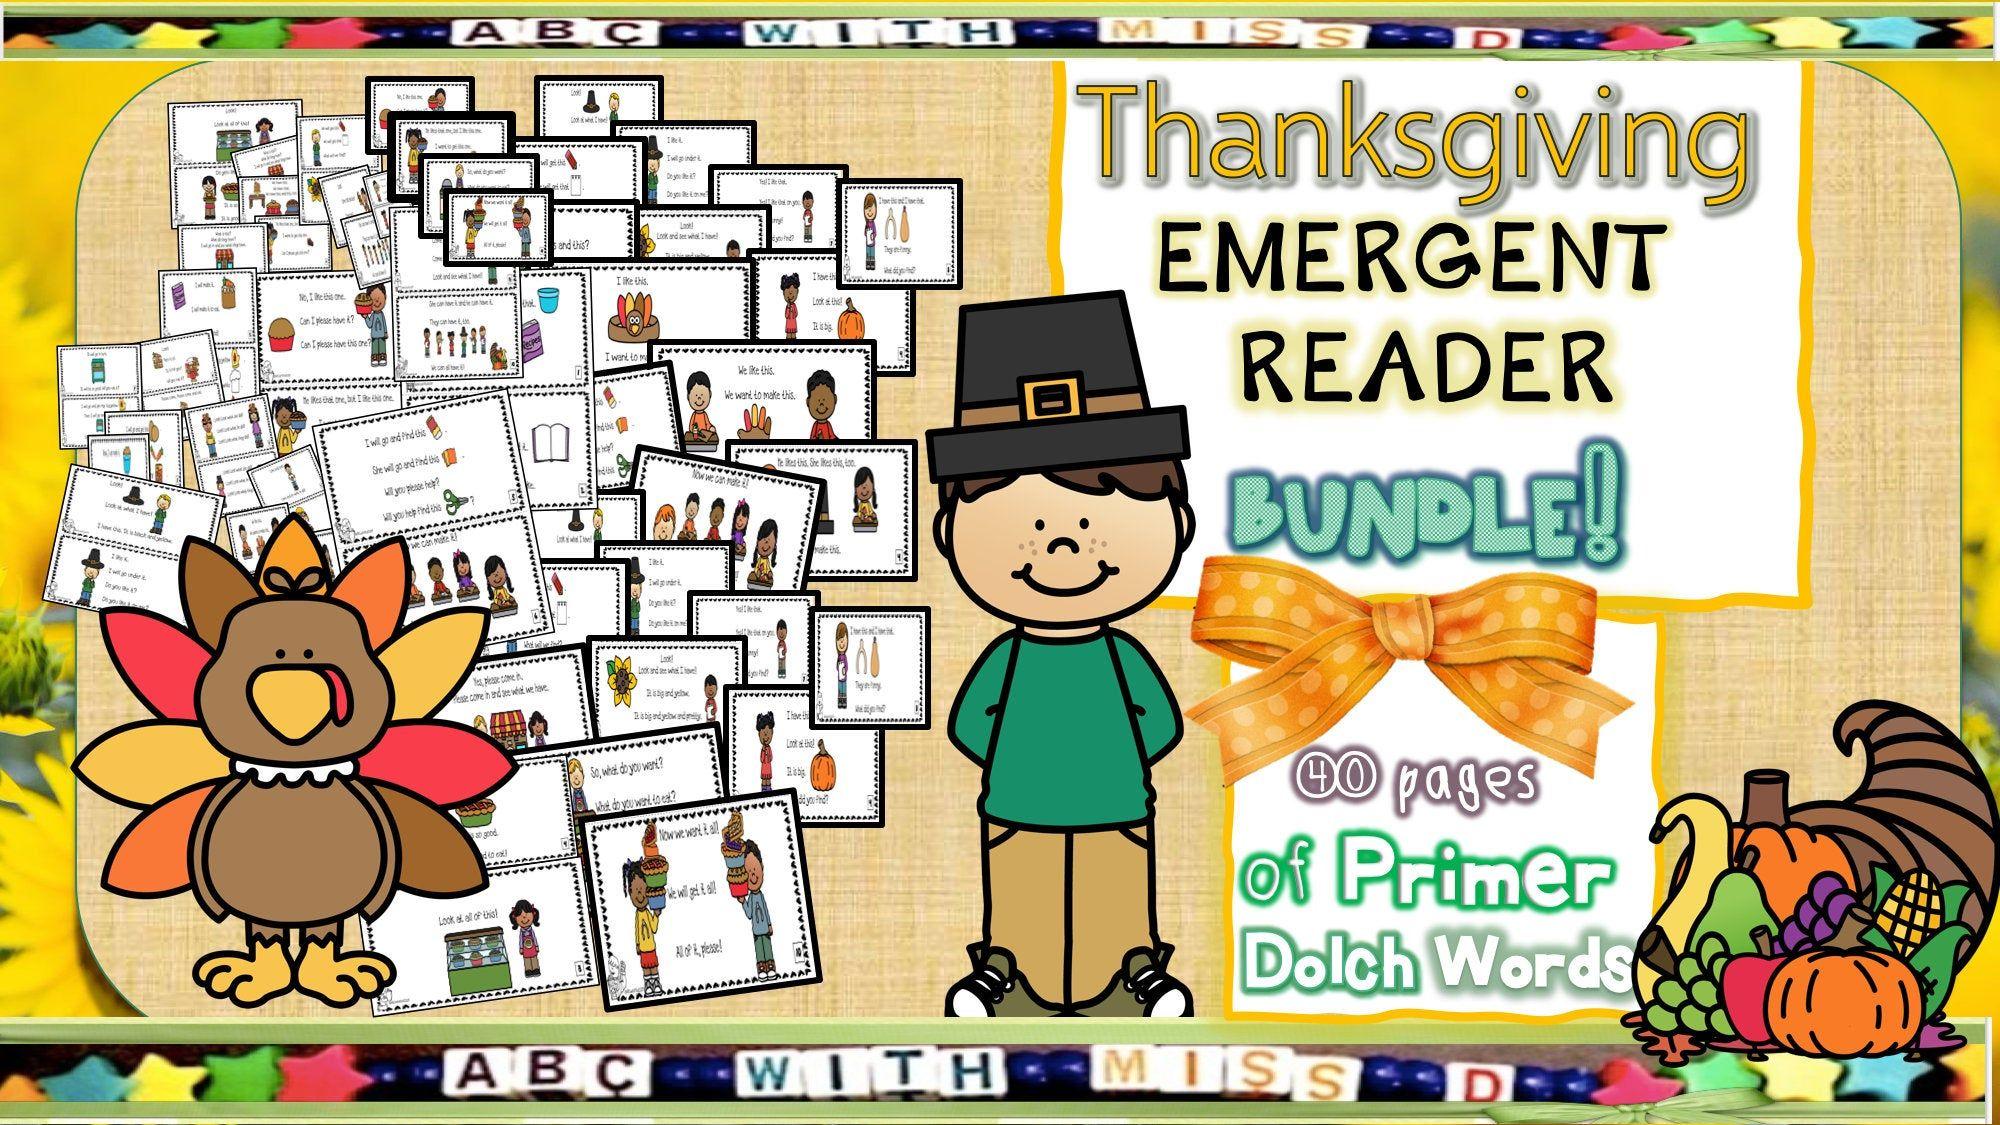 Thanksgiving Themed Emergent Reader Bundle 4 Printable